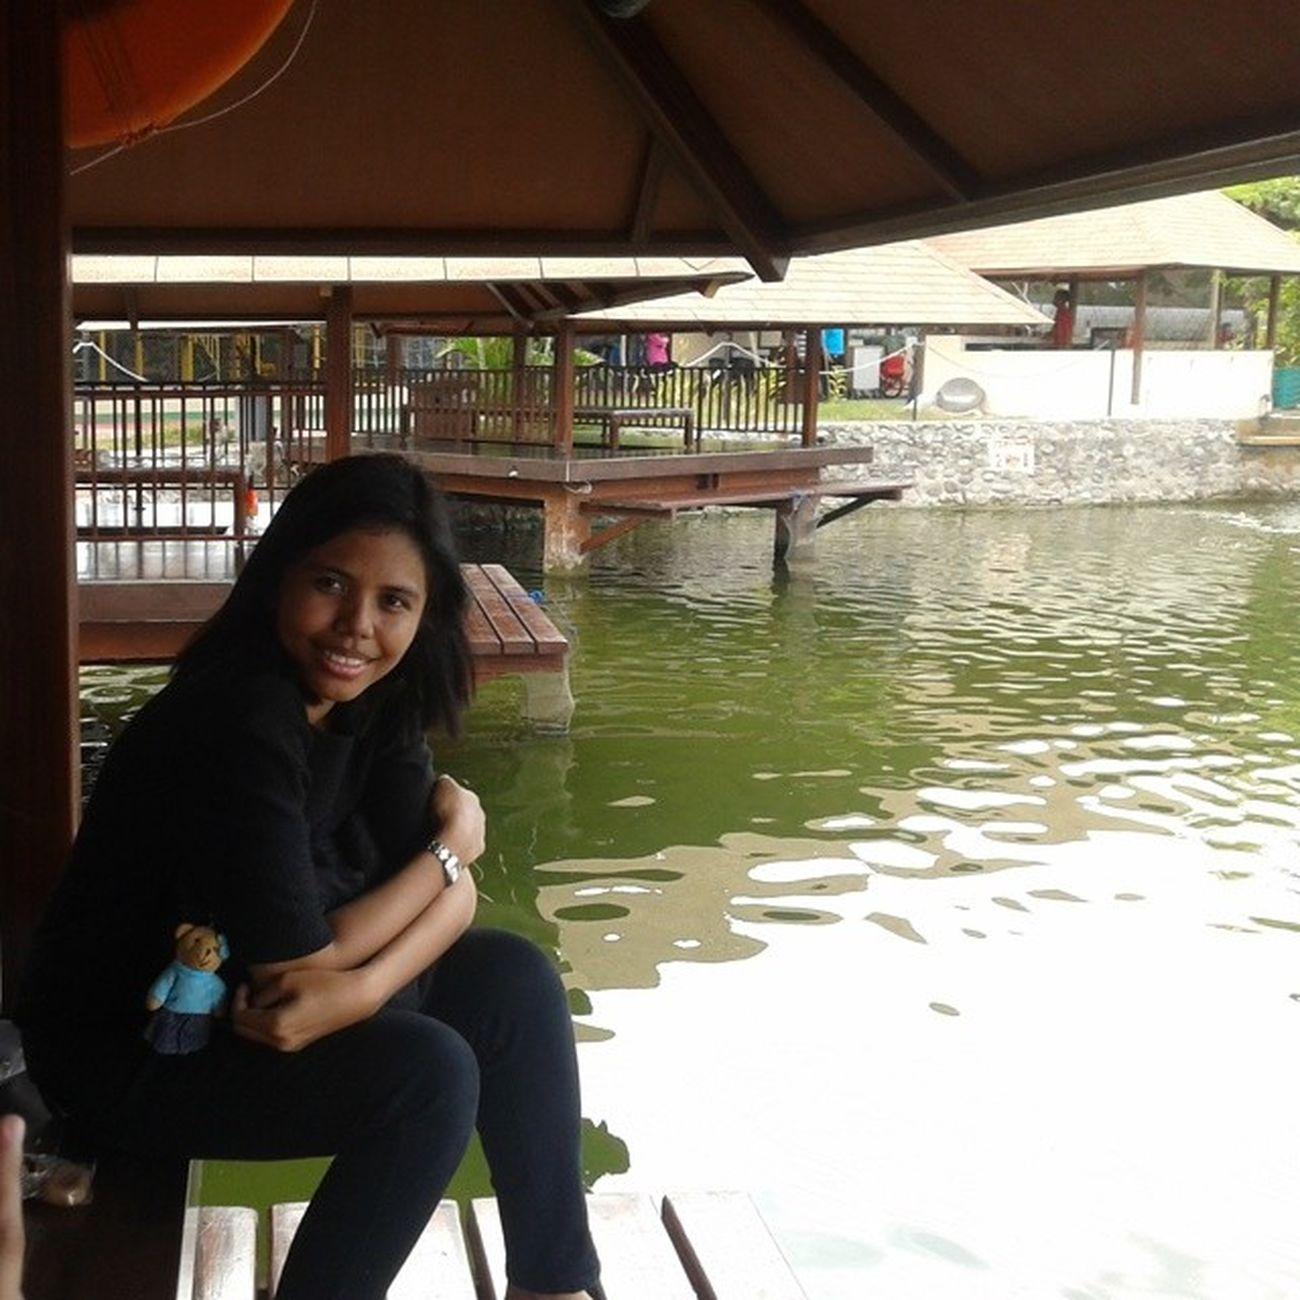 Me Indonesianwomen Lunch Restaurant Seafood Telagabarombong Barombong Instamakassar